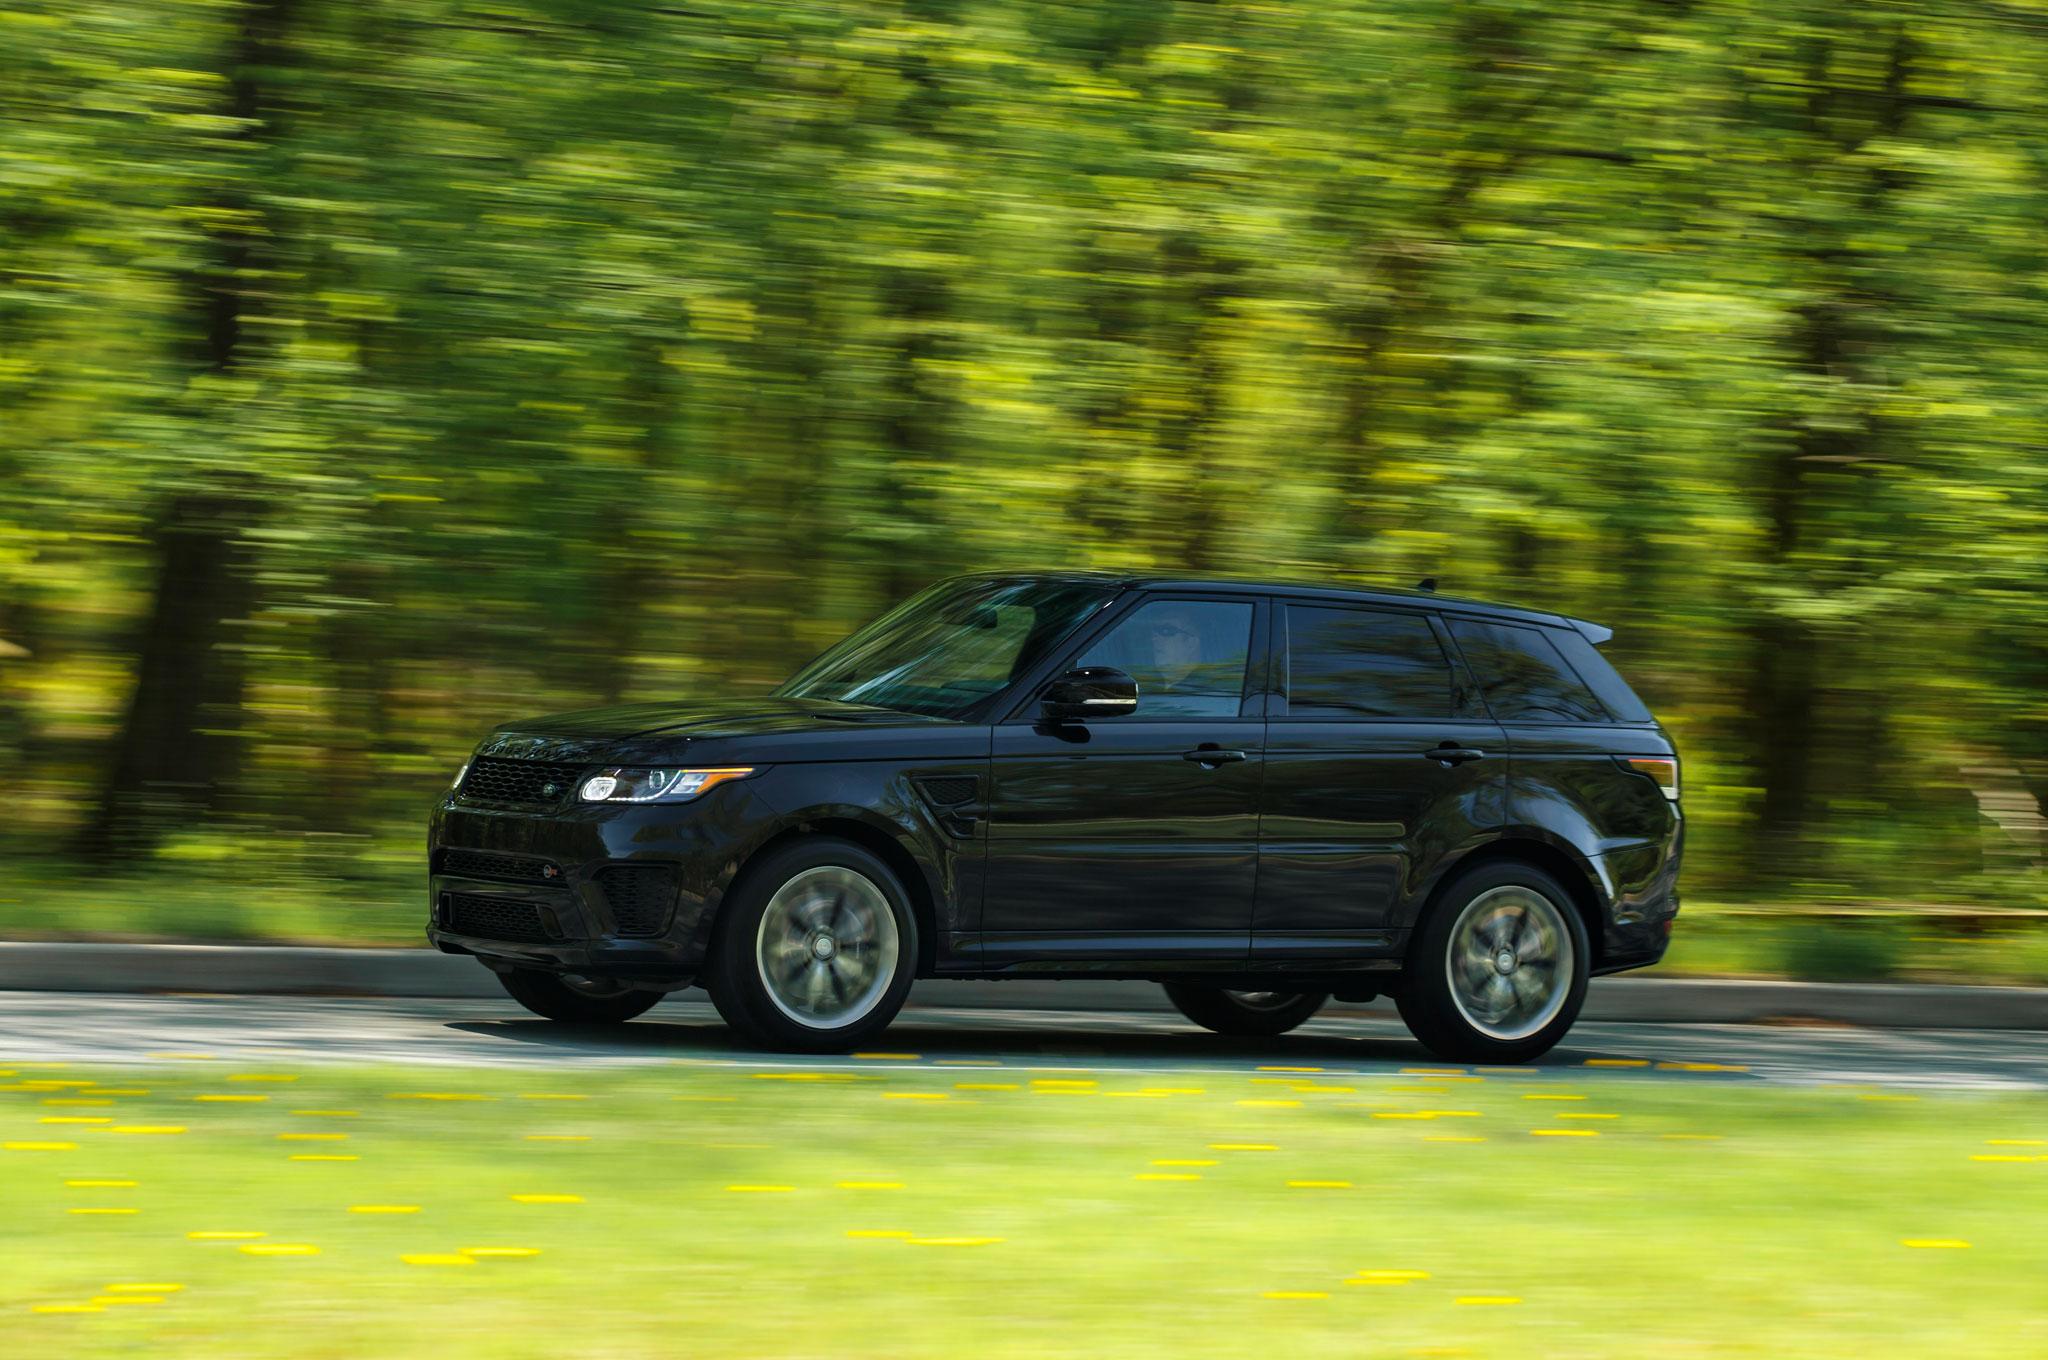 2015 land rover range rover sport svr review automobile magazine. Black Bedroom Furniture Sets. Home Design Ideas